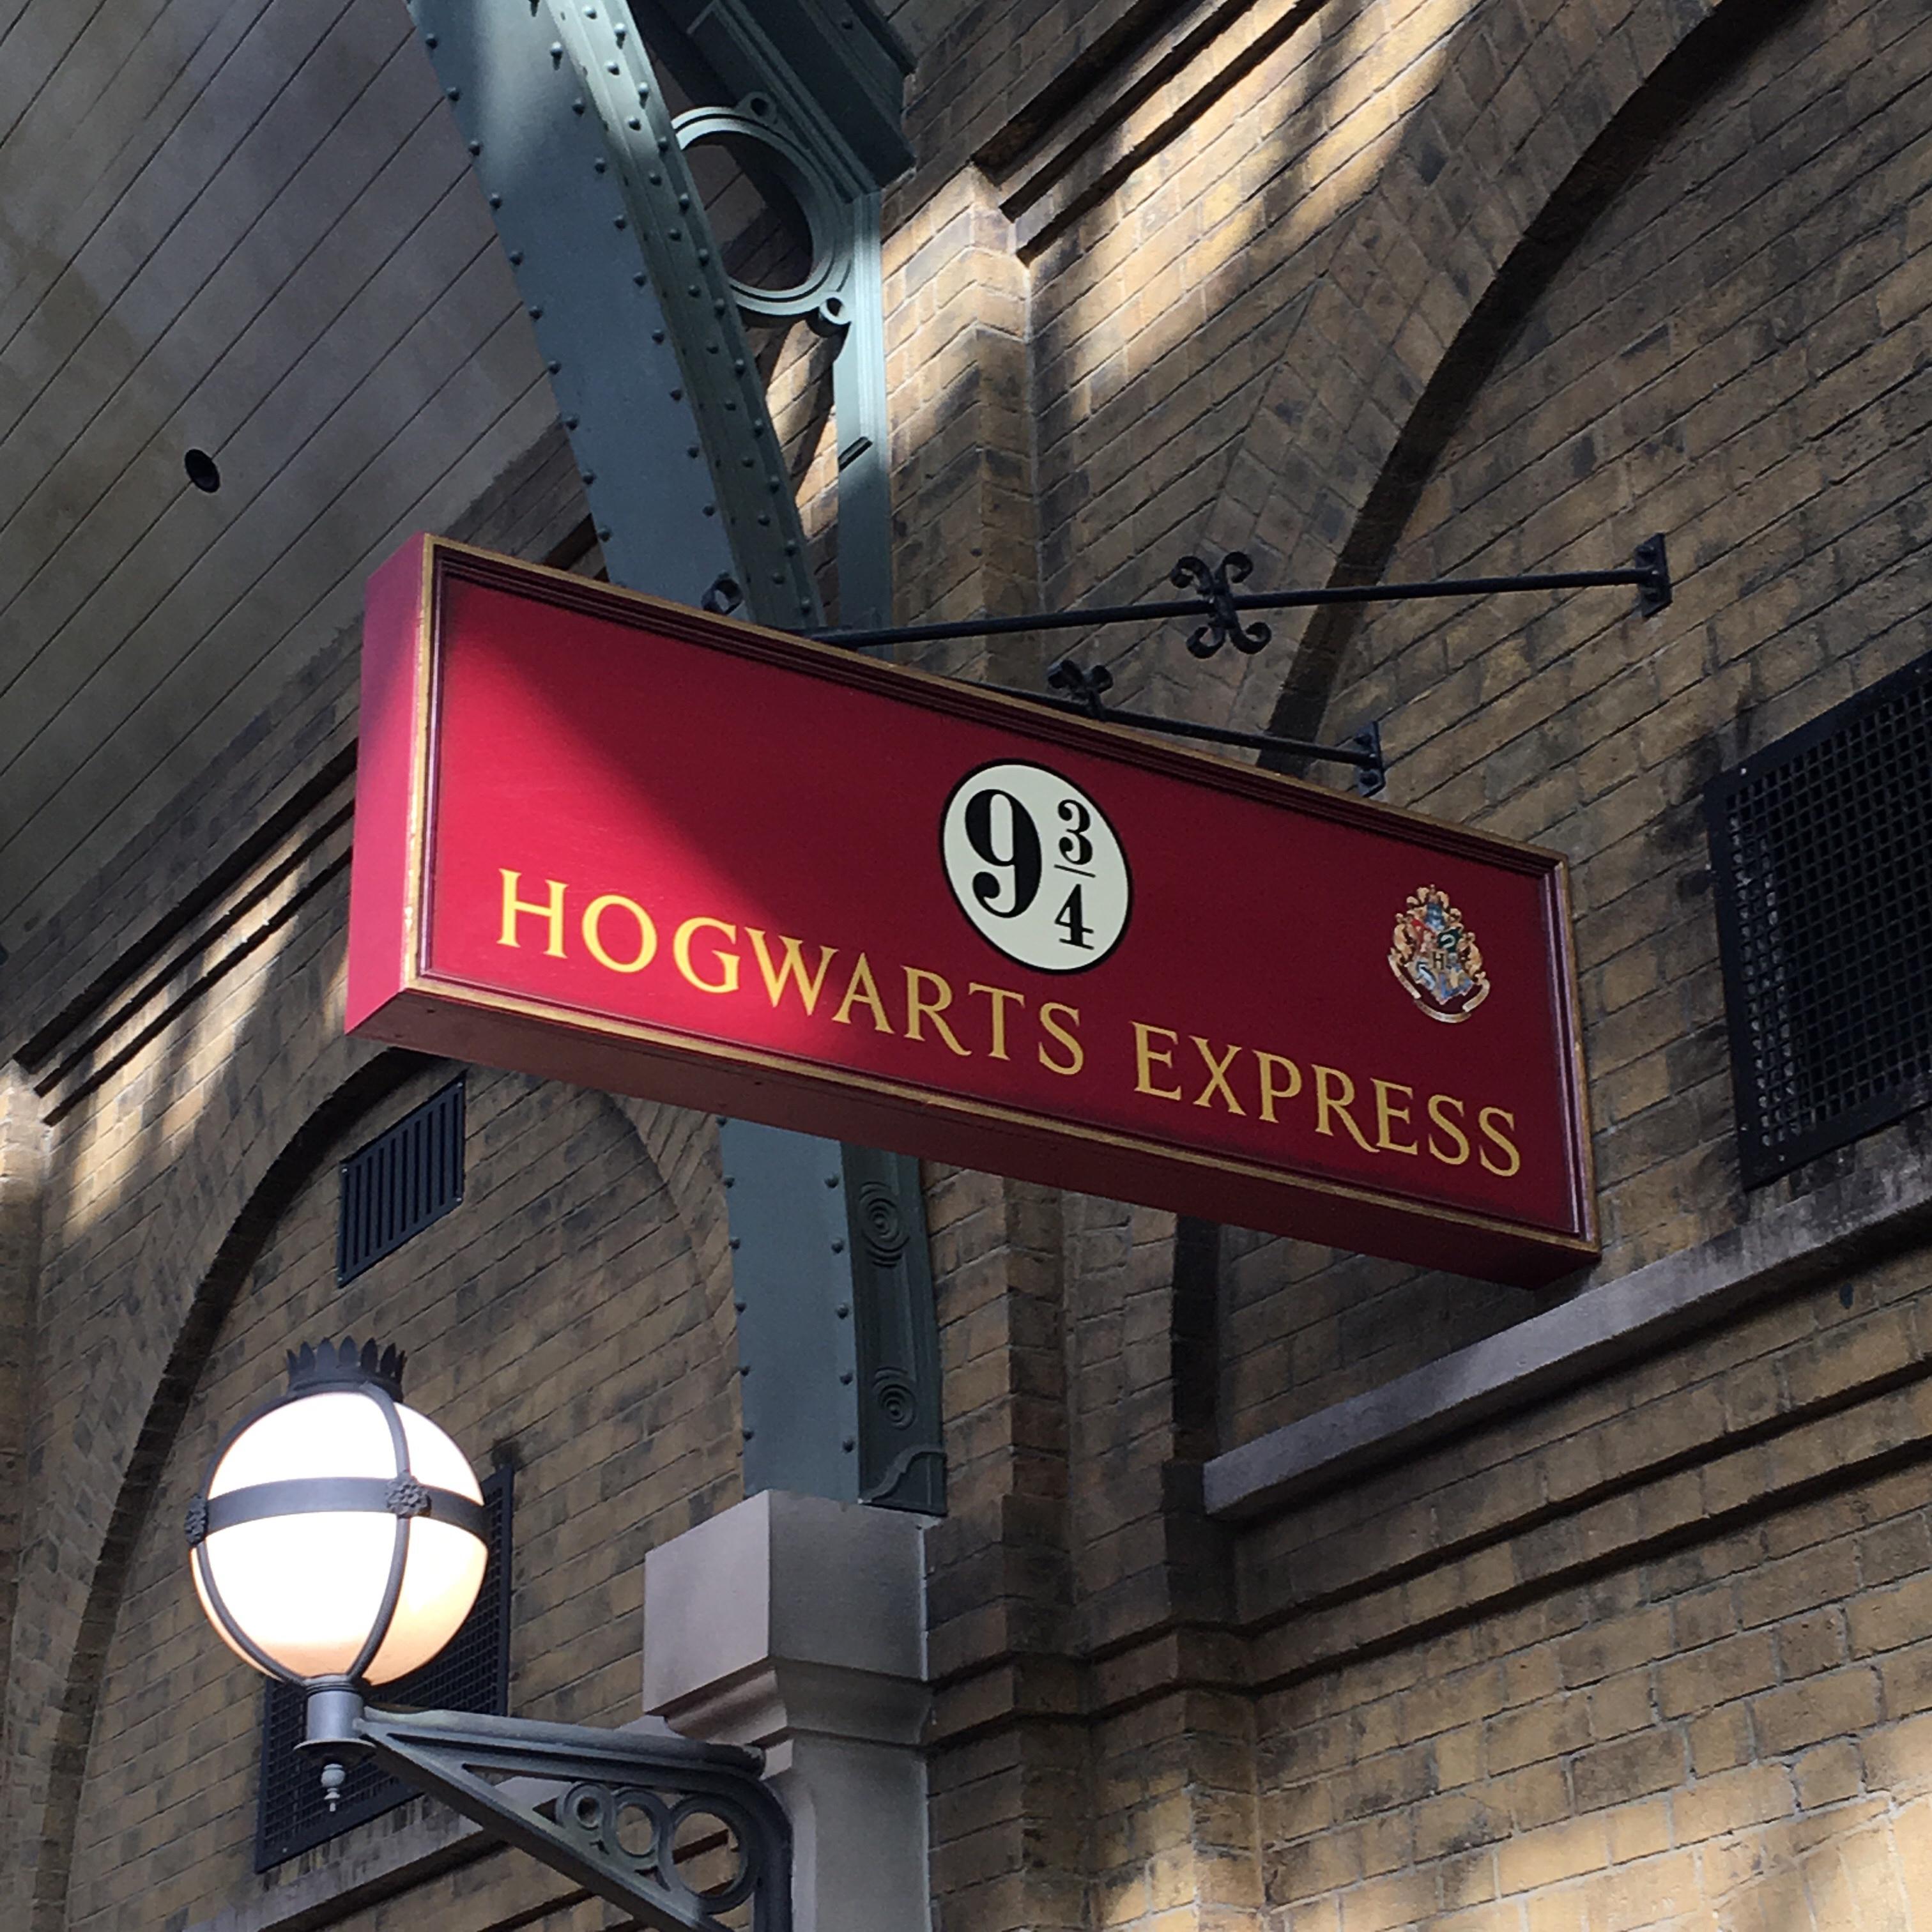 Platform 9 3/4 Harry Potter World